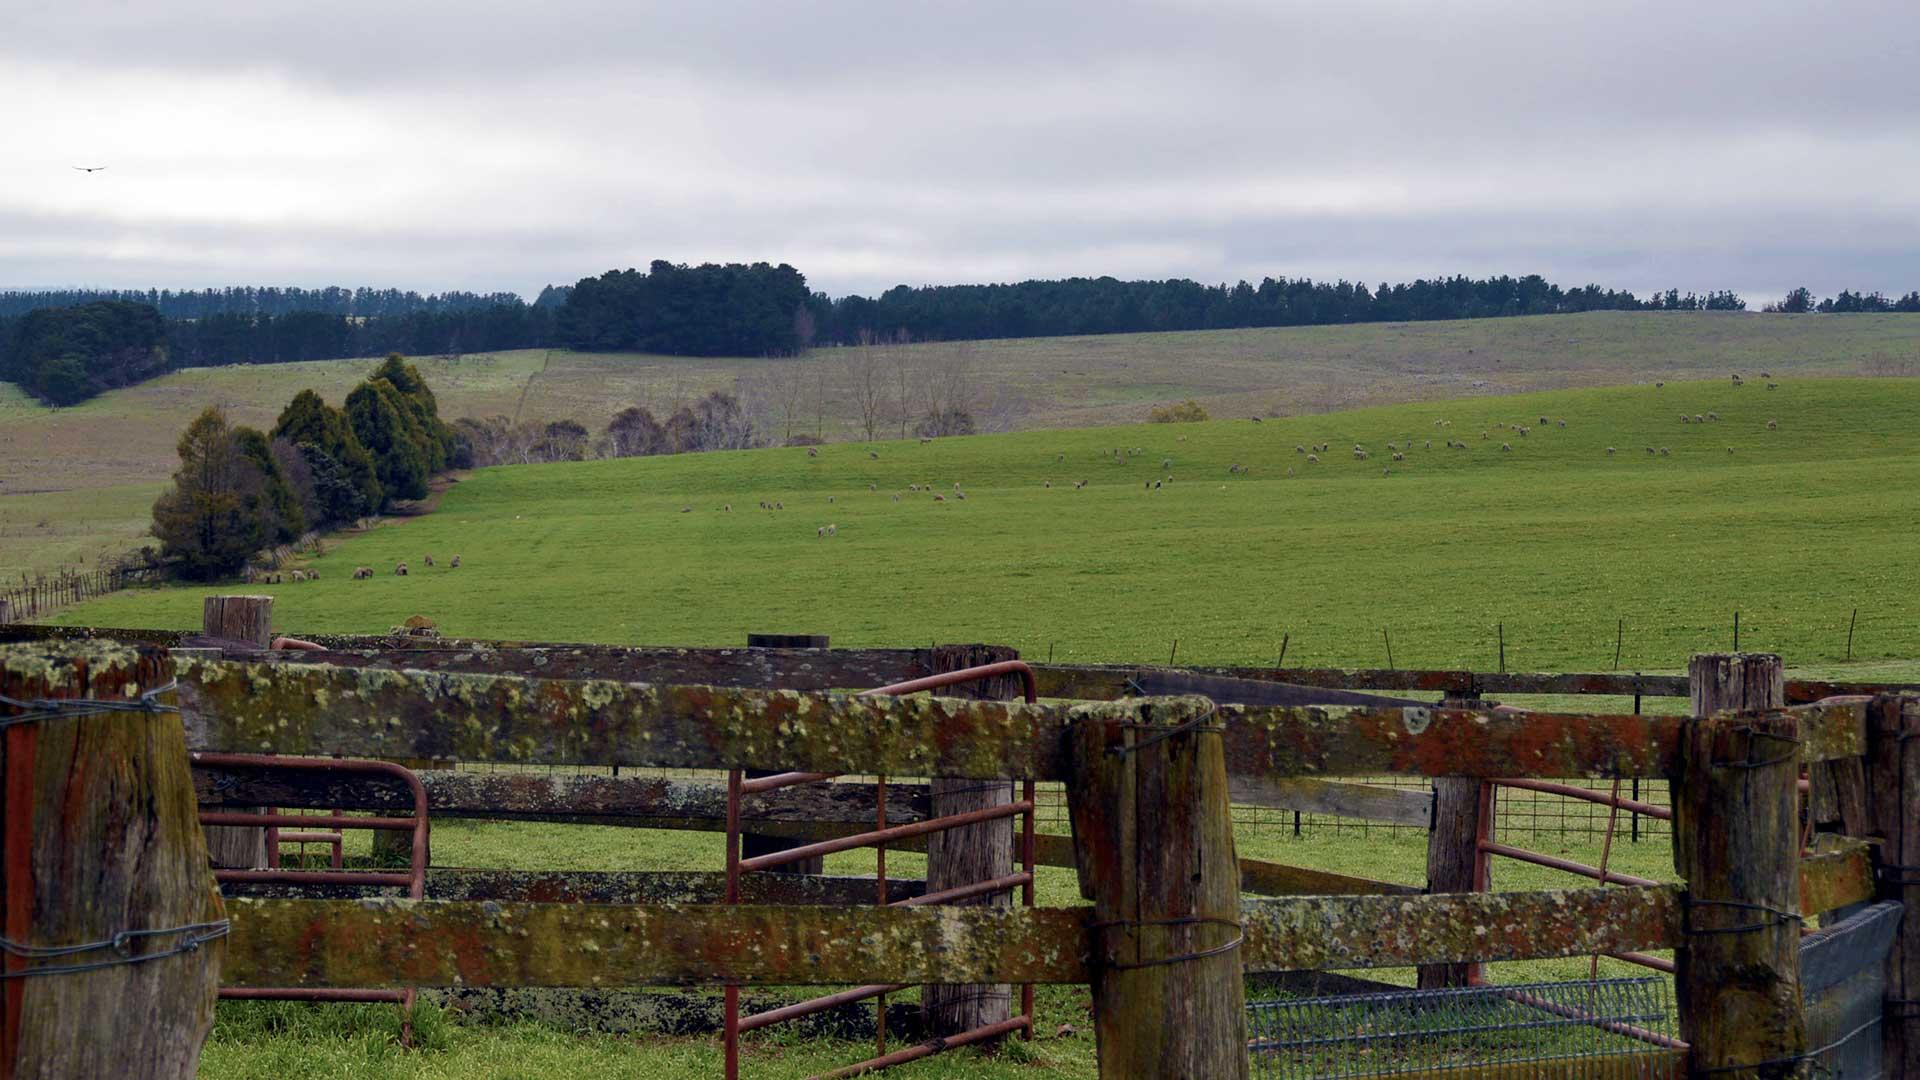 New England - Green Fields | Merino Superior Sires